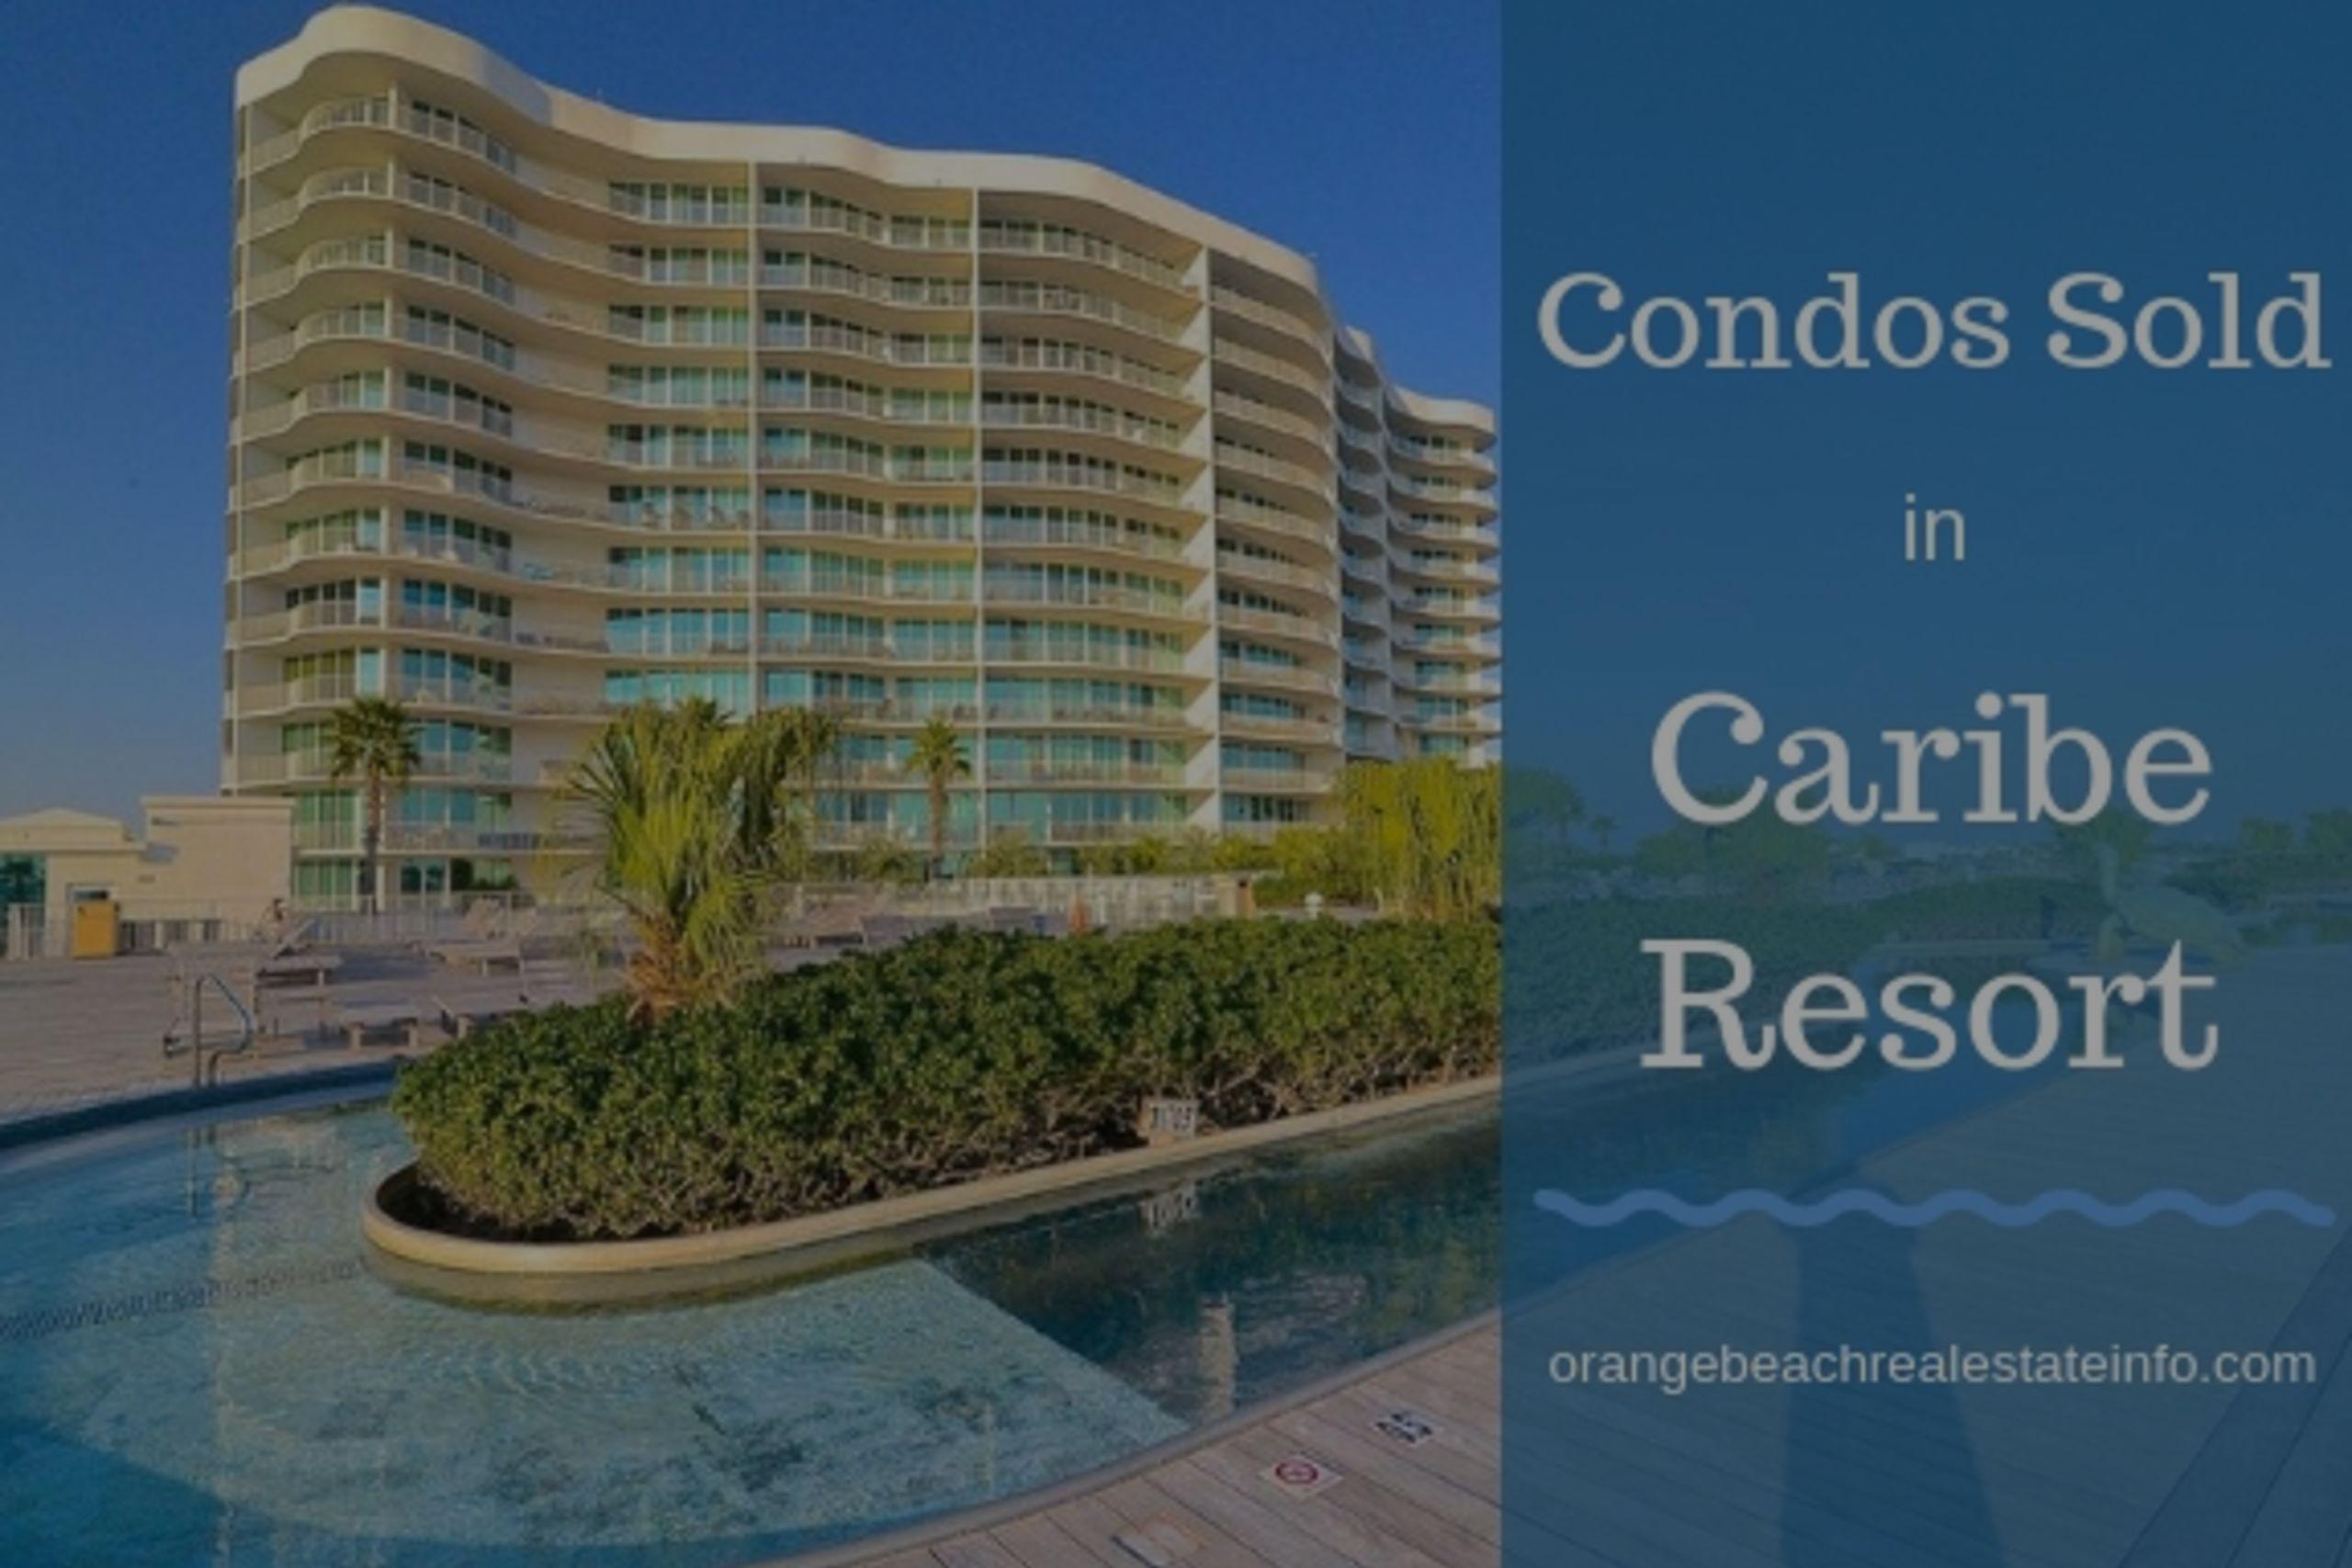 Condos Sold in Caribe Resort – August/September 2018